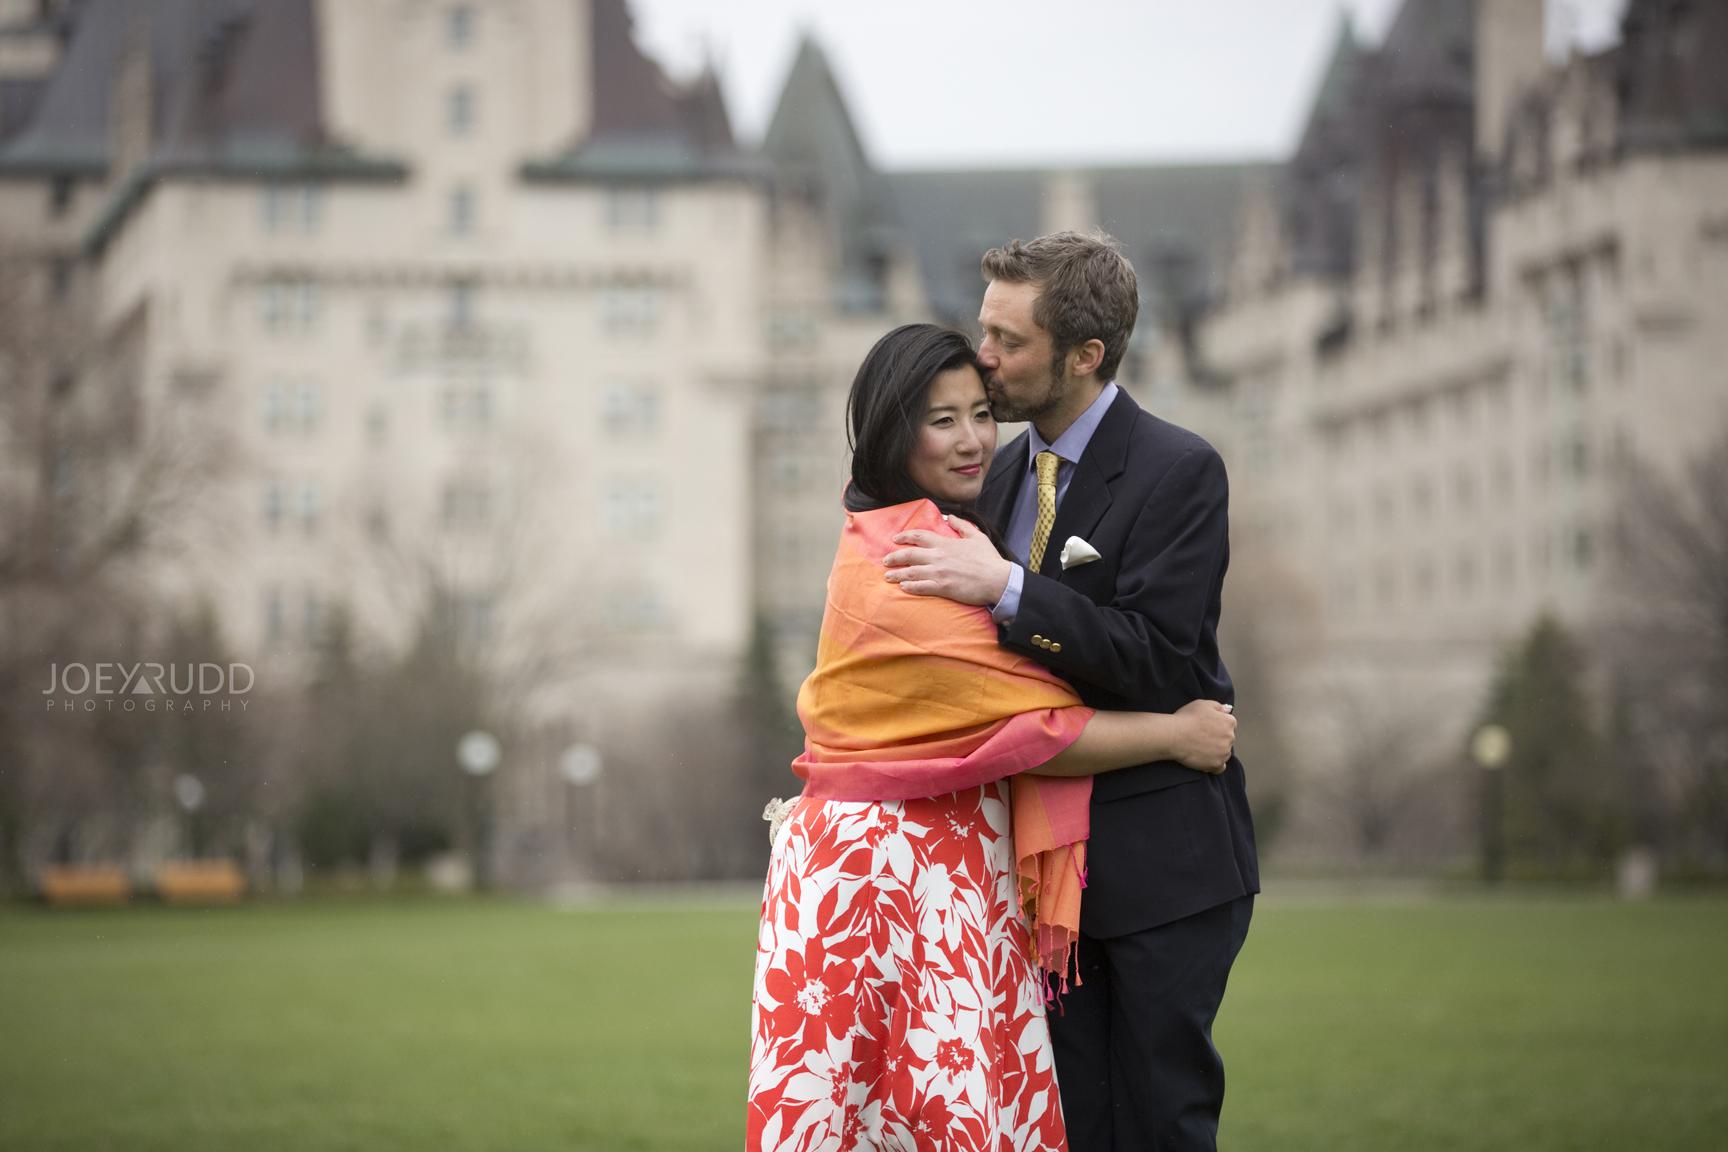 Ottawa Elopement Wedding Photographer Joey Rudd Photography Chateau Laurier Majors Hill Park